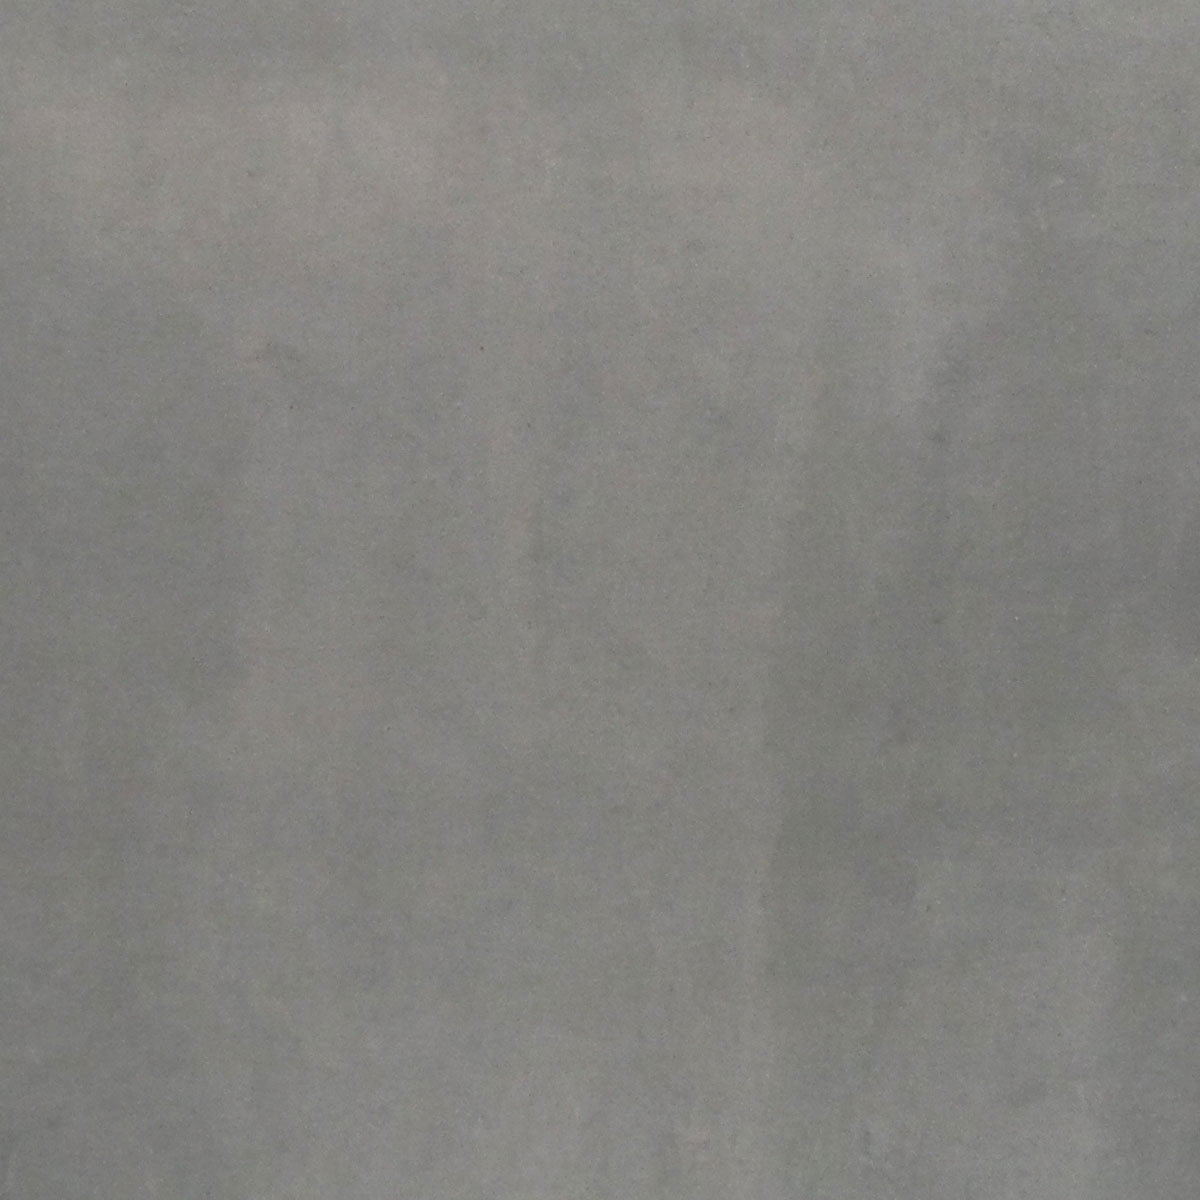 T-Trading Coutura Dark Grey cc01-60x60 Bodenfliese 60x60 matt